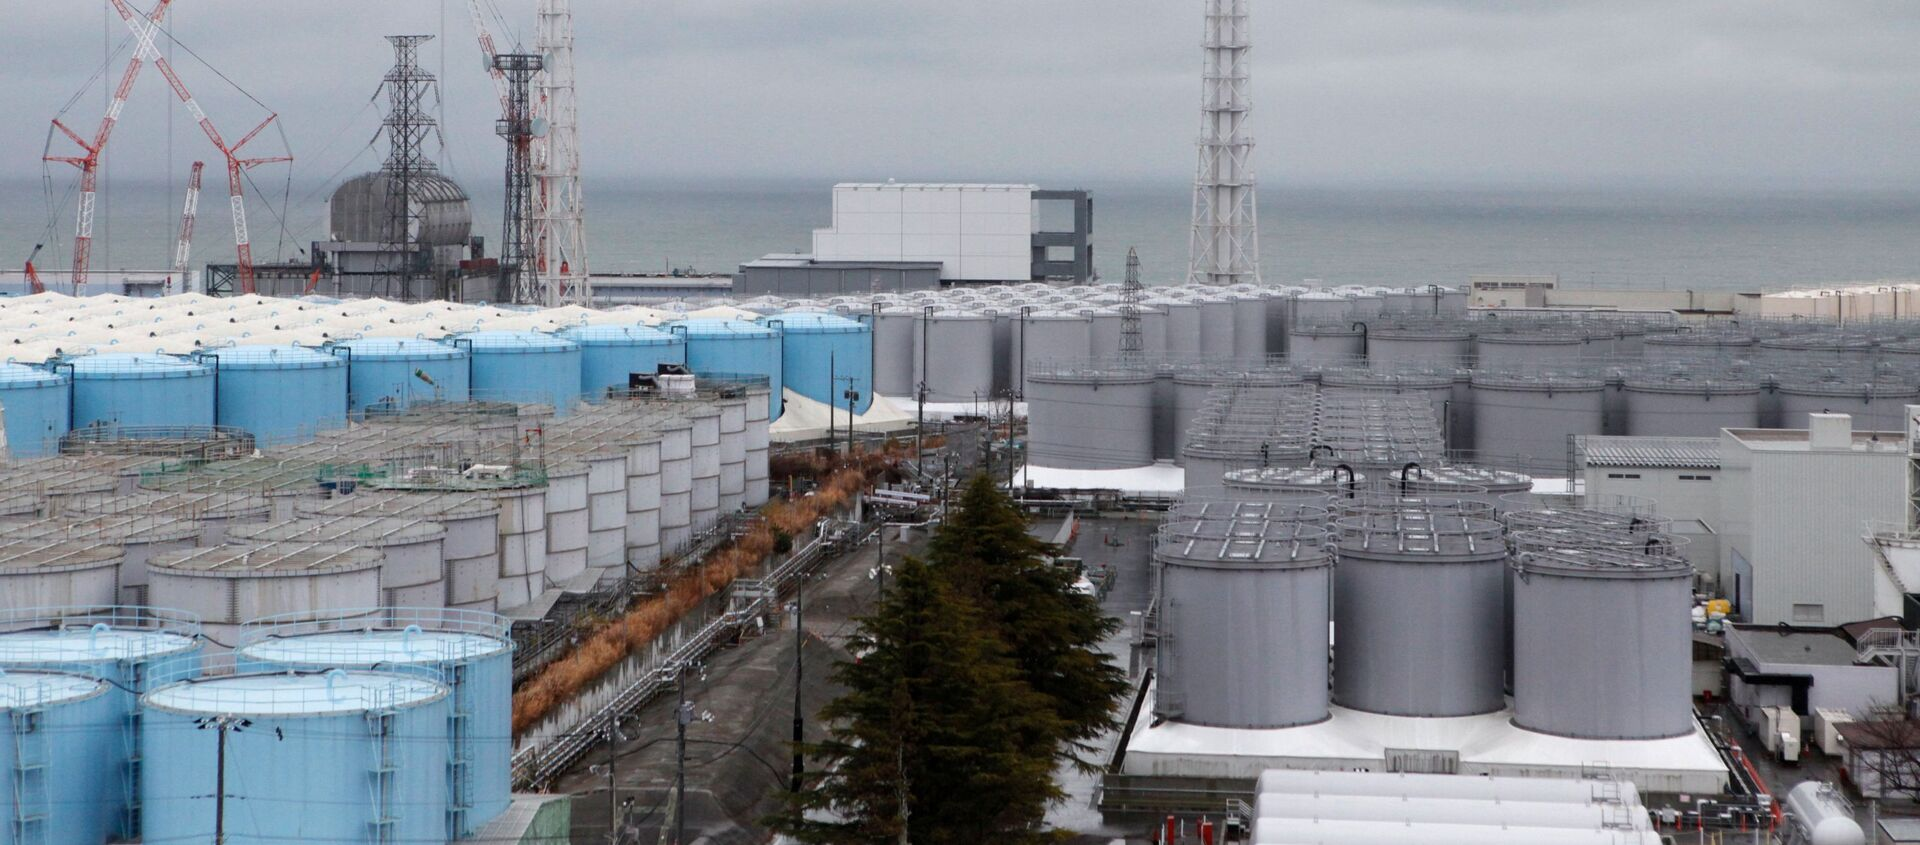 Storage tanks for radioactive water are seen at tsunami-crippled Fukushima Daiichi nuclear power plant - Sputnik International, 1920, 10.11.2020